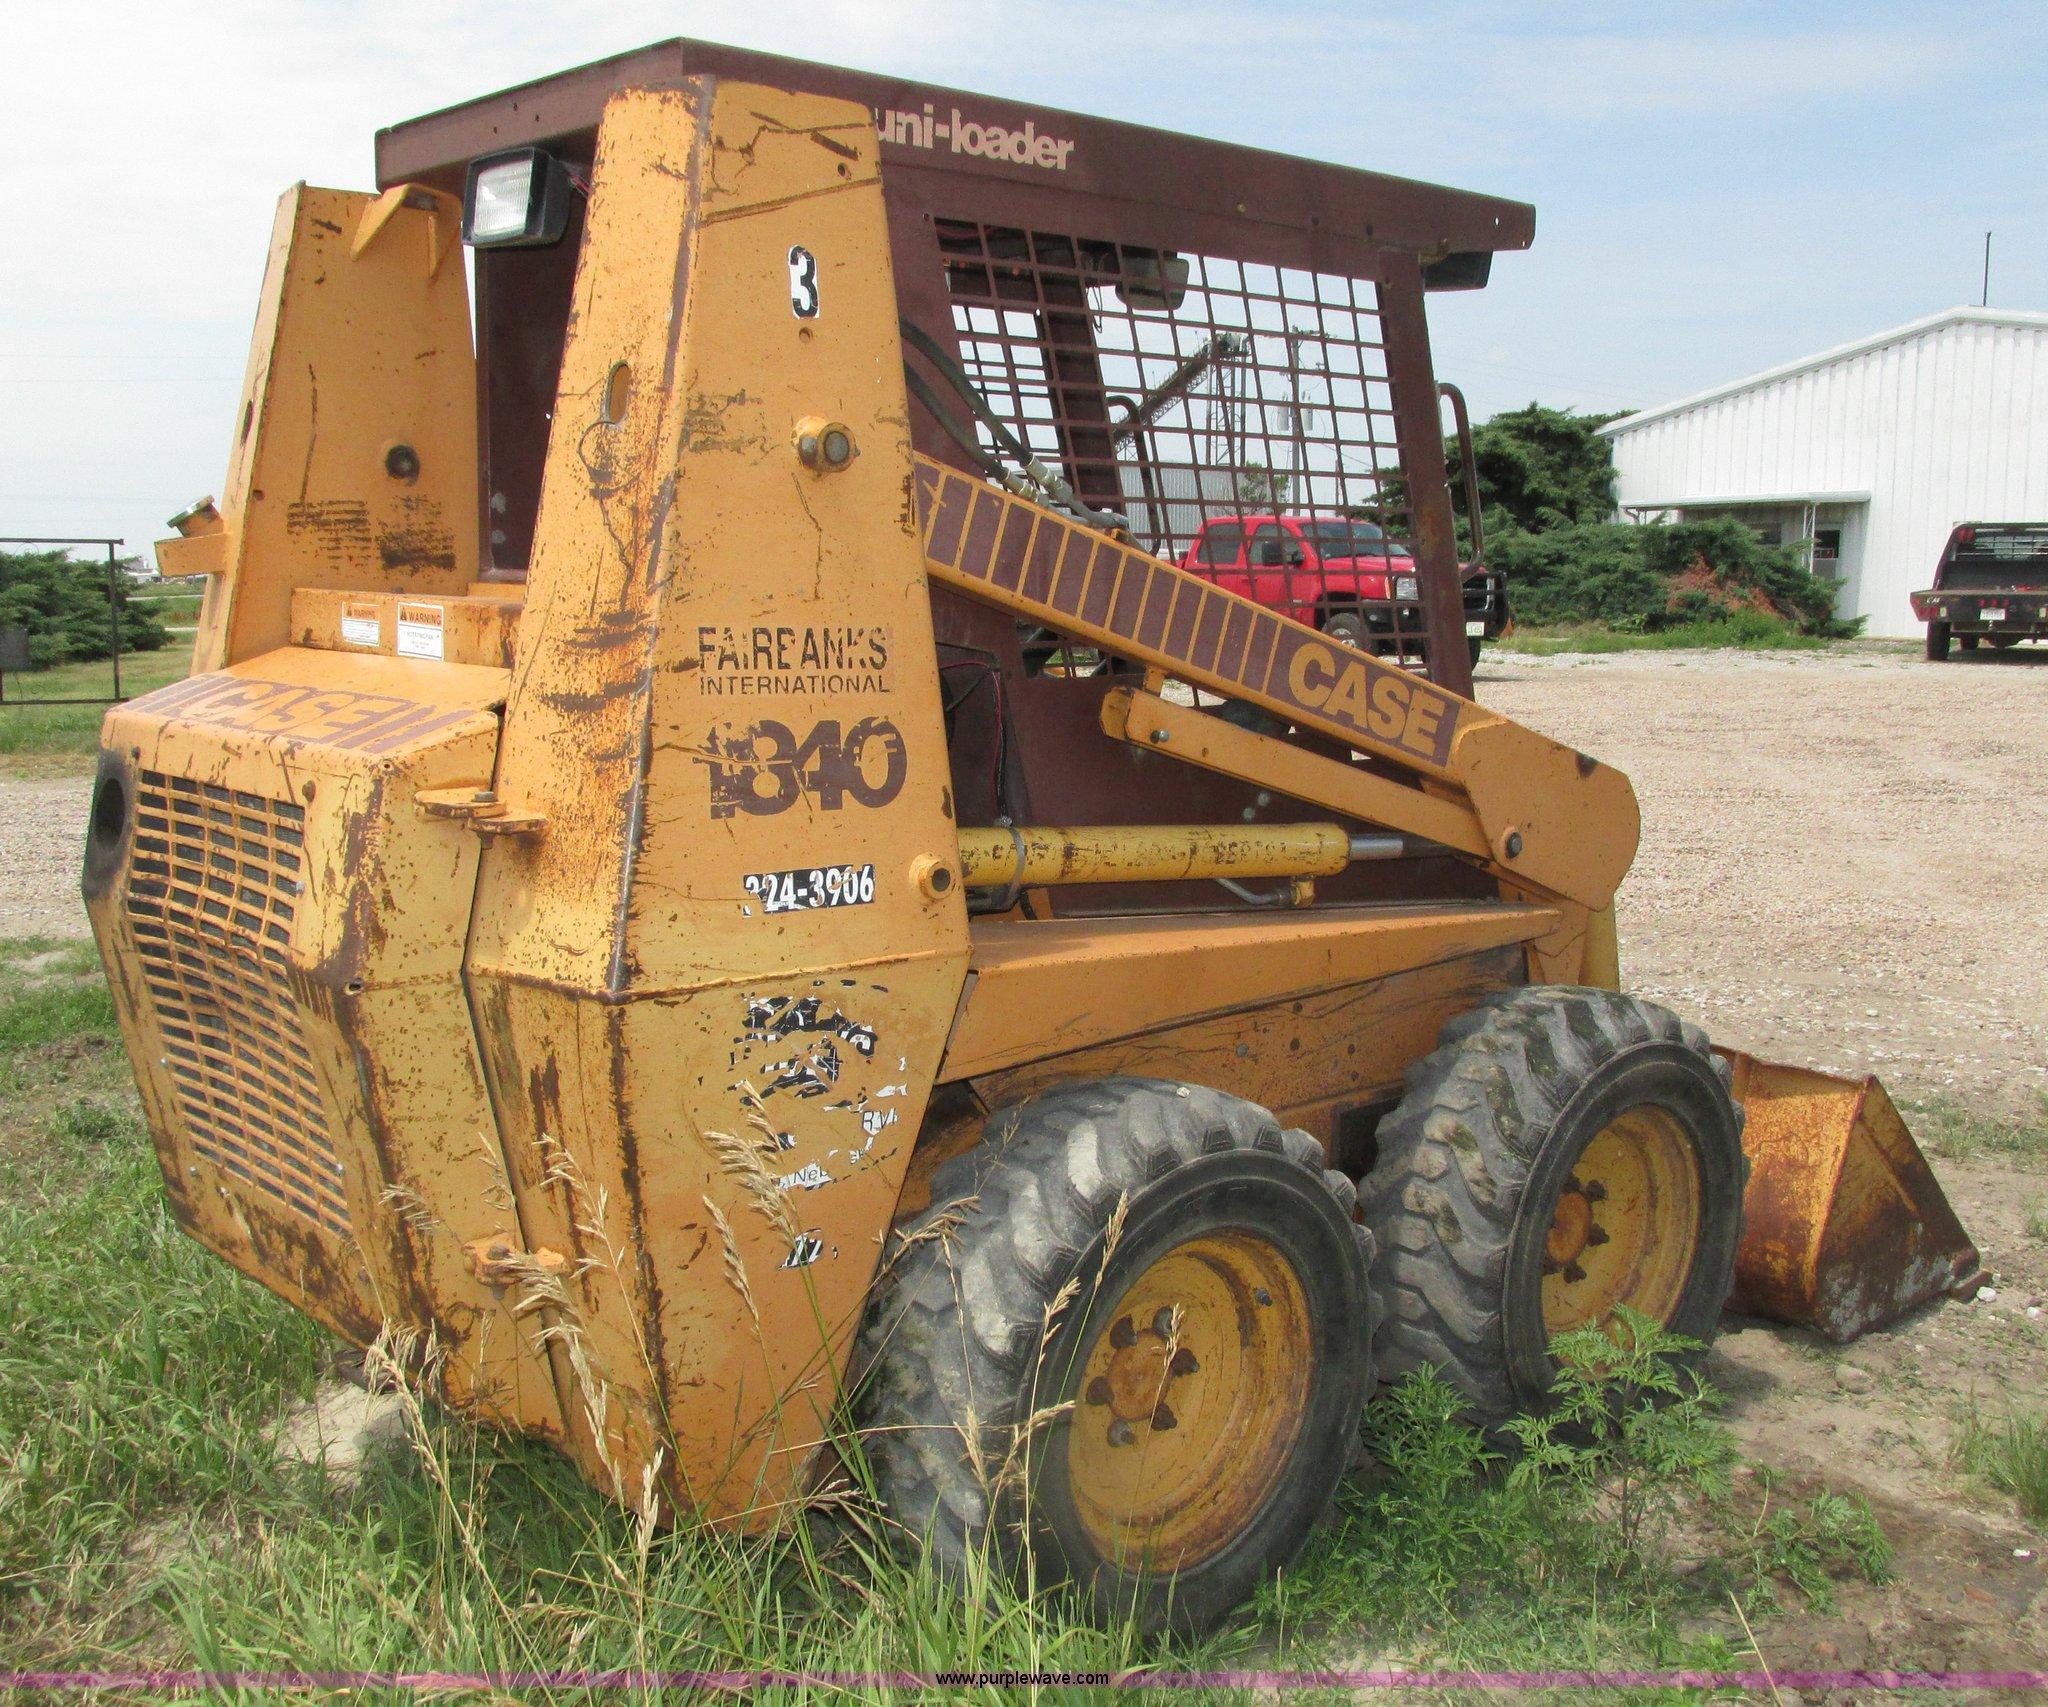 1993 Case 1840 skid steer | Item H4565 | SOLD! Thursday Augu